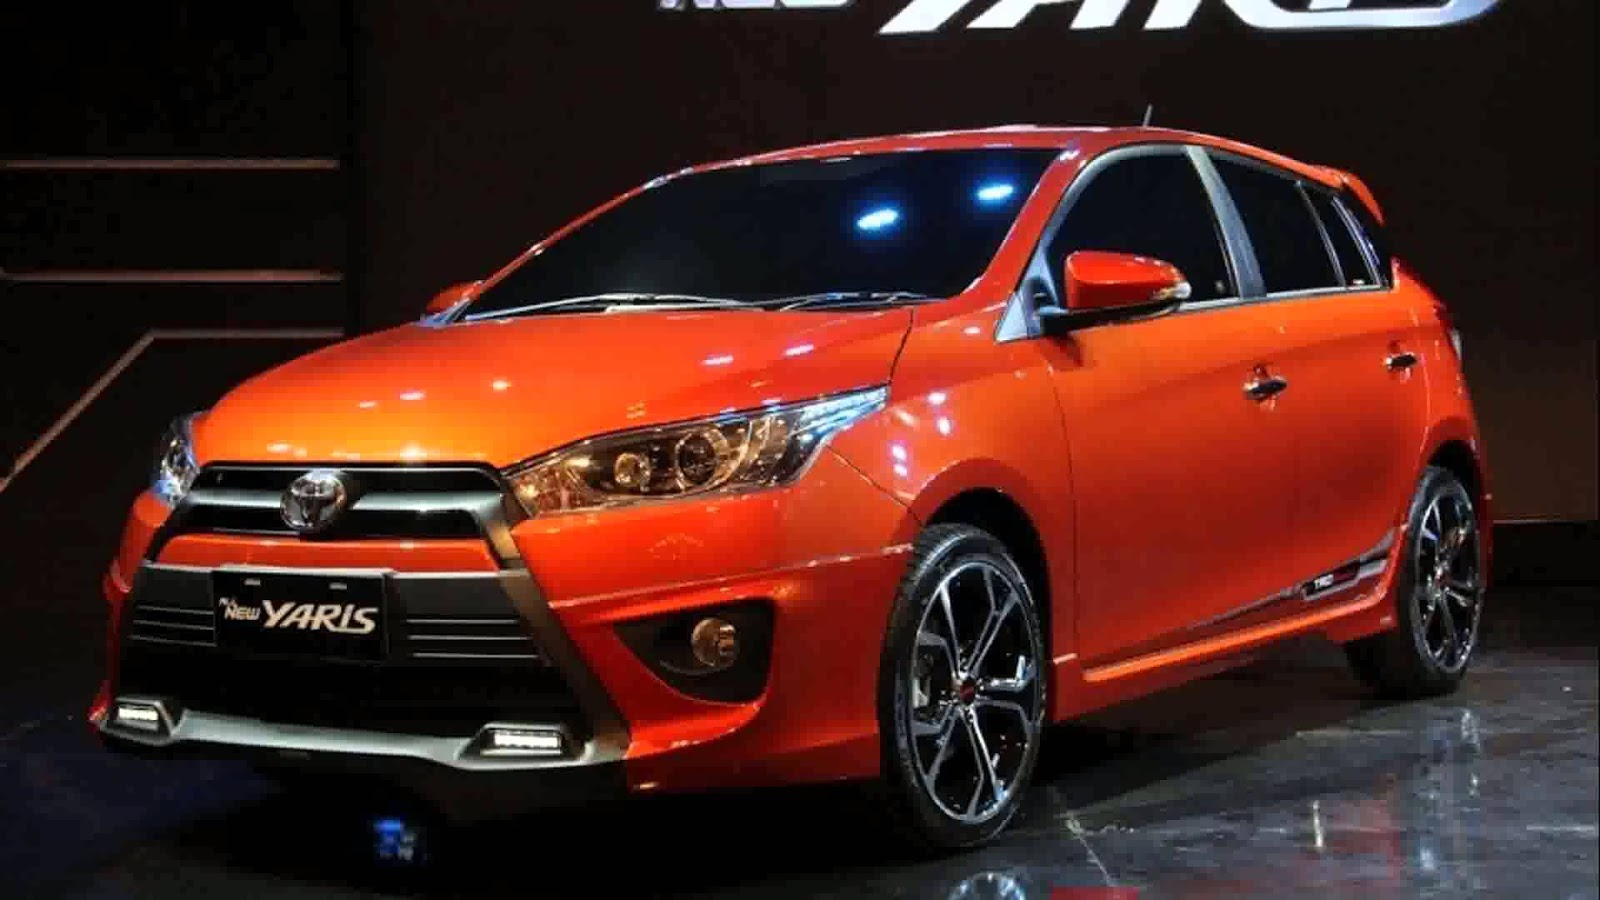 harga all new kijang innova 2016 type g yaris trd sportivo 2014 promo kredit toyota bandung 2017, ...